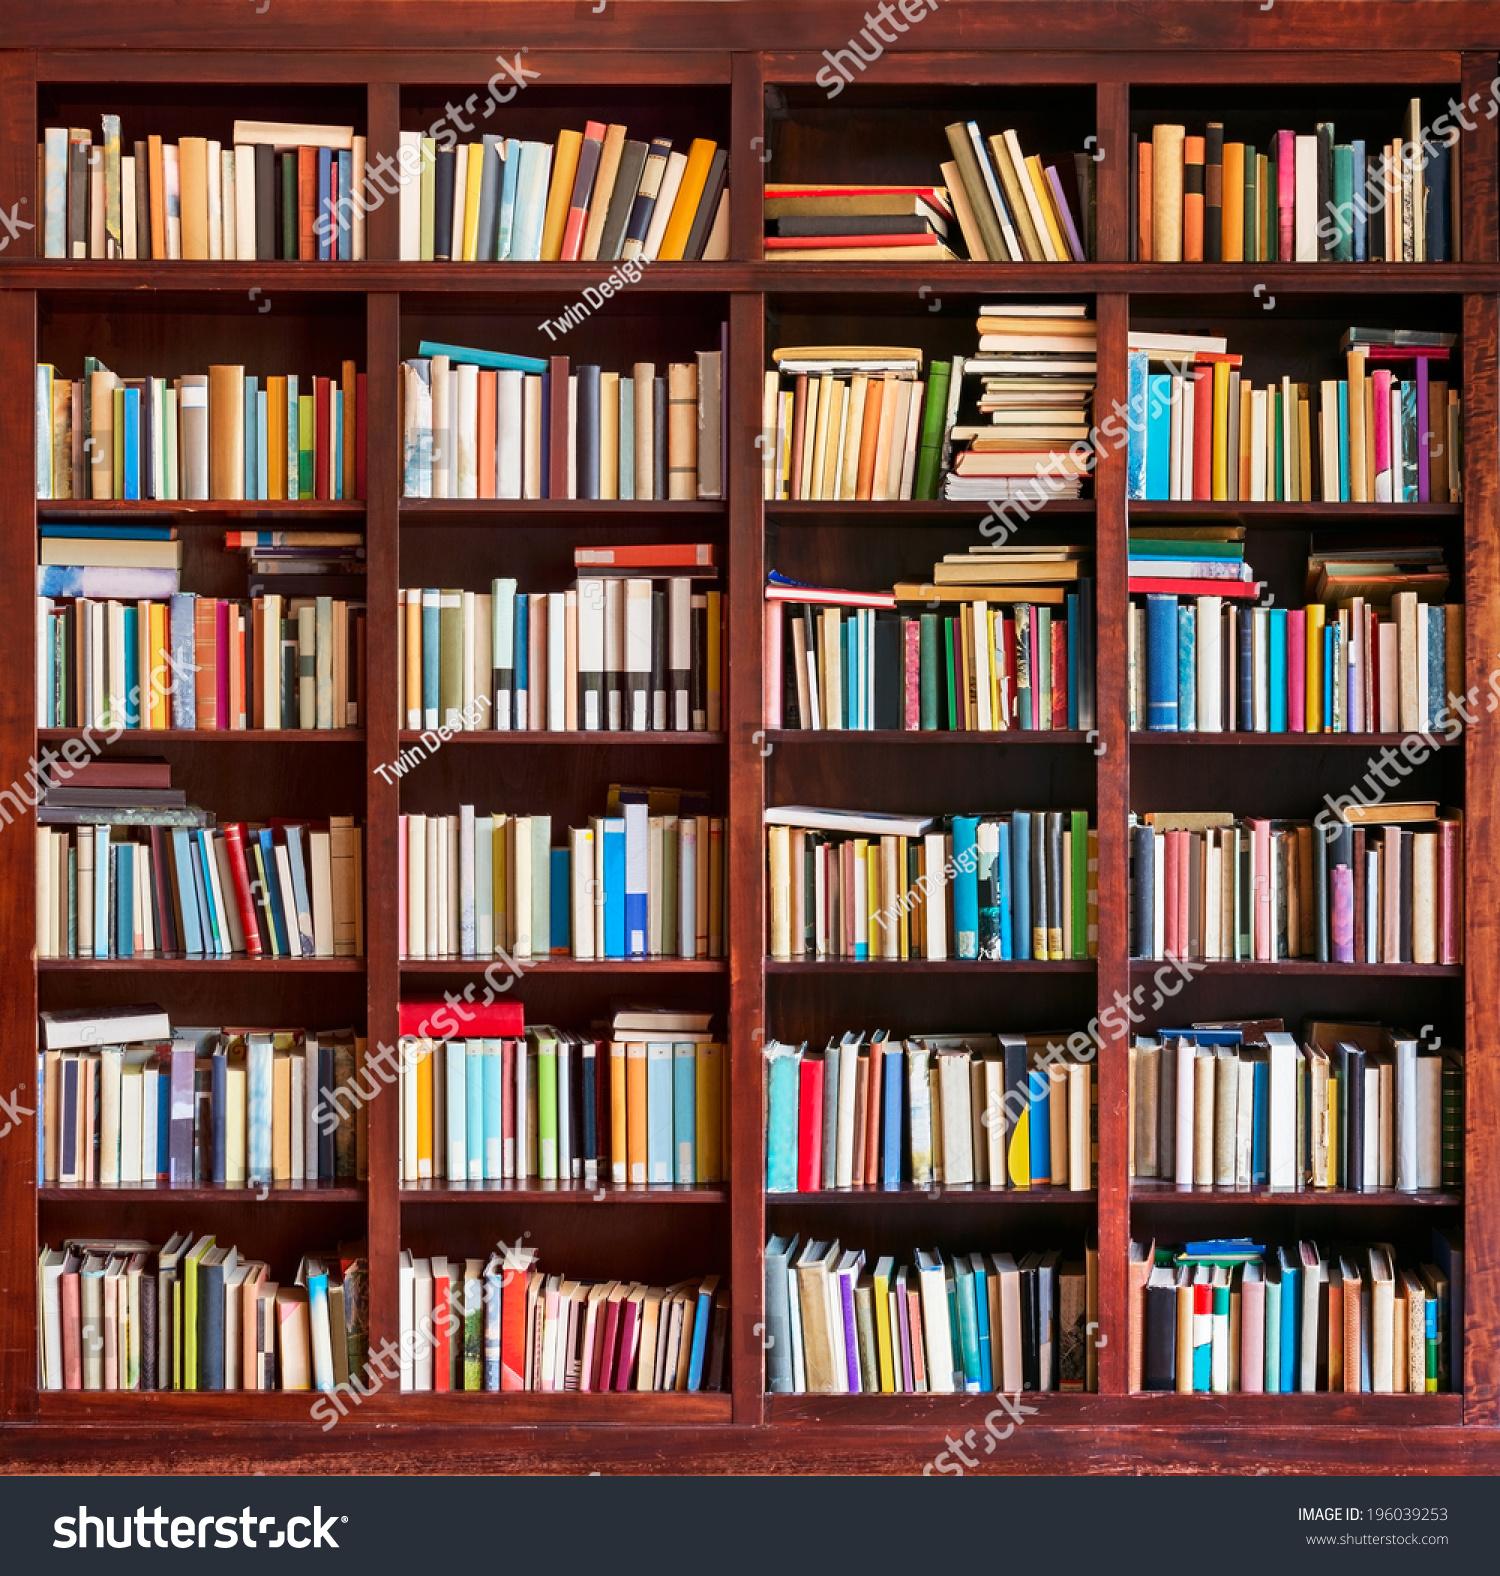 Bookshelf background stock photo 196039253 shutterstock - Book shelf pics ...